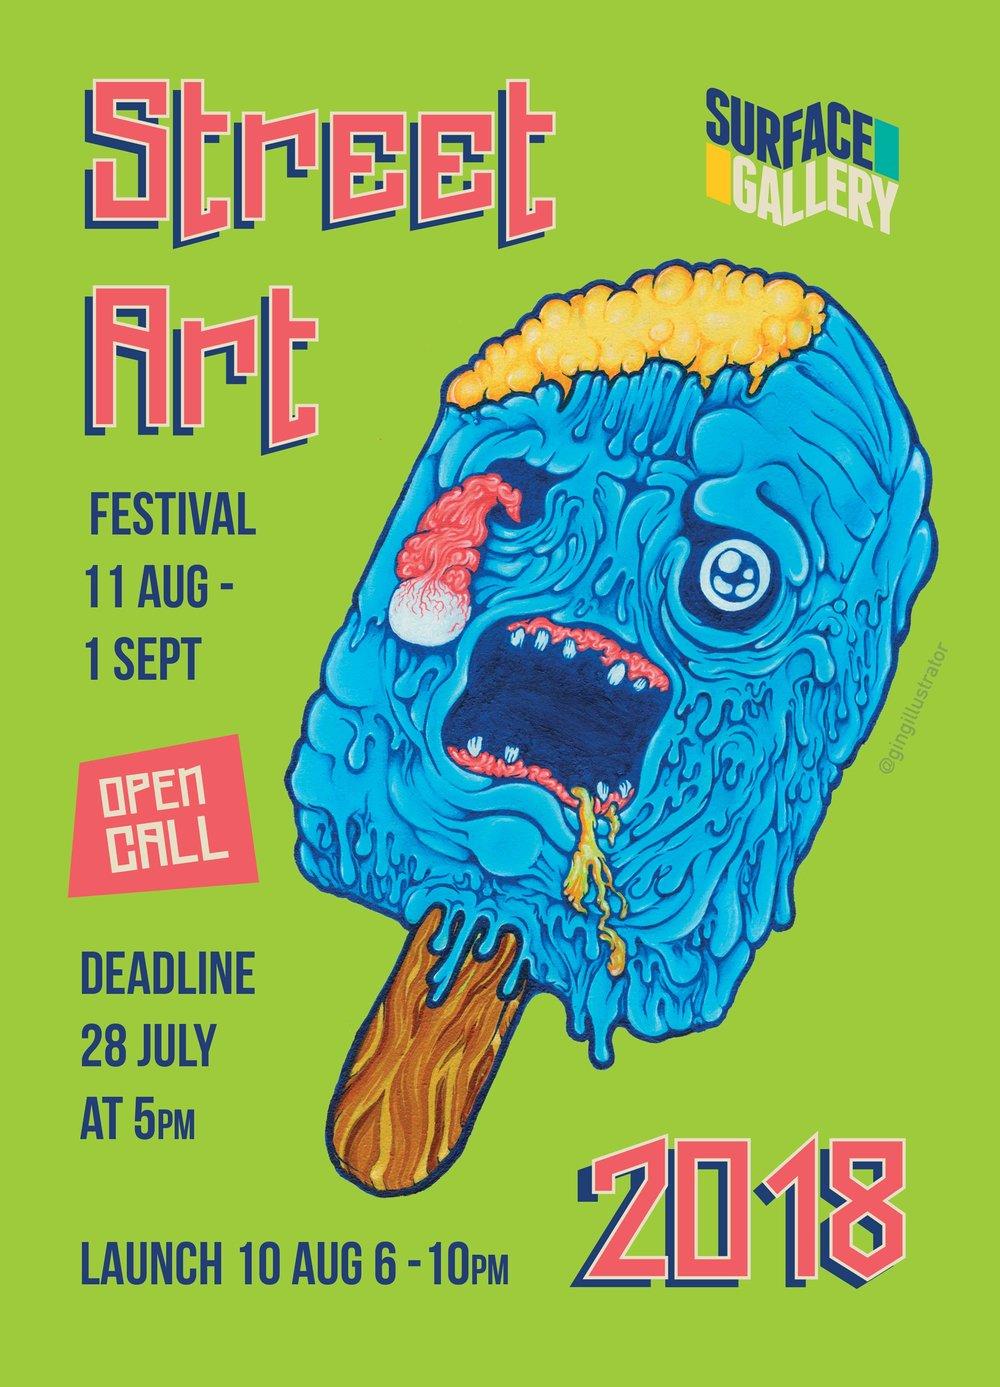 street art festival 2018 surface gallery